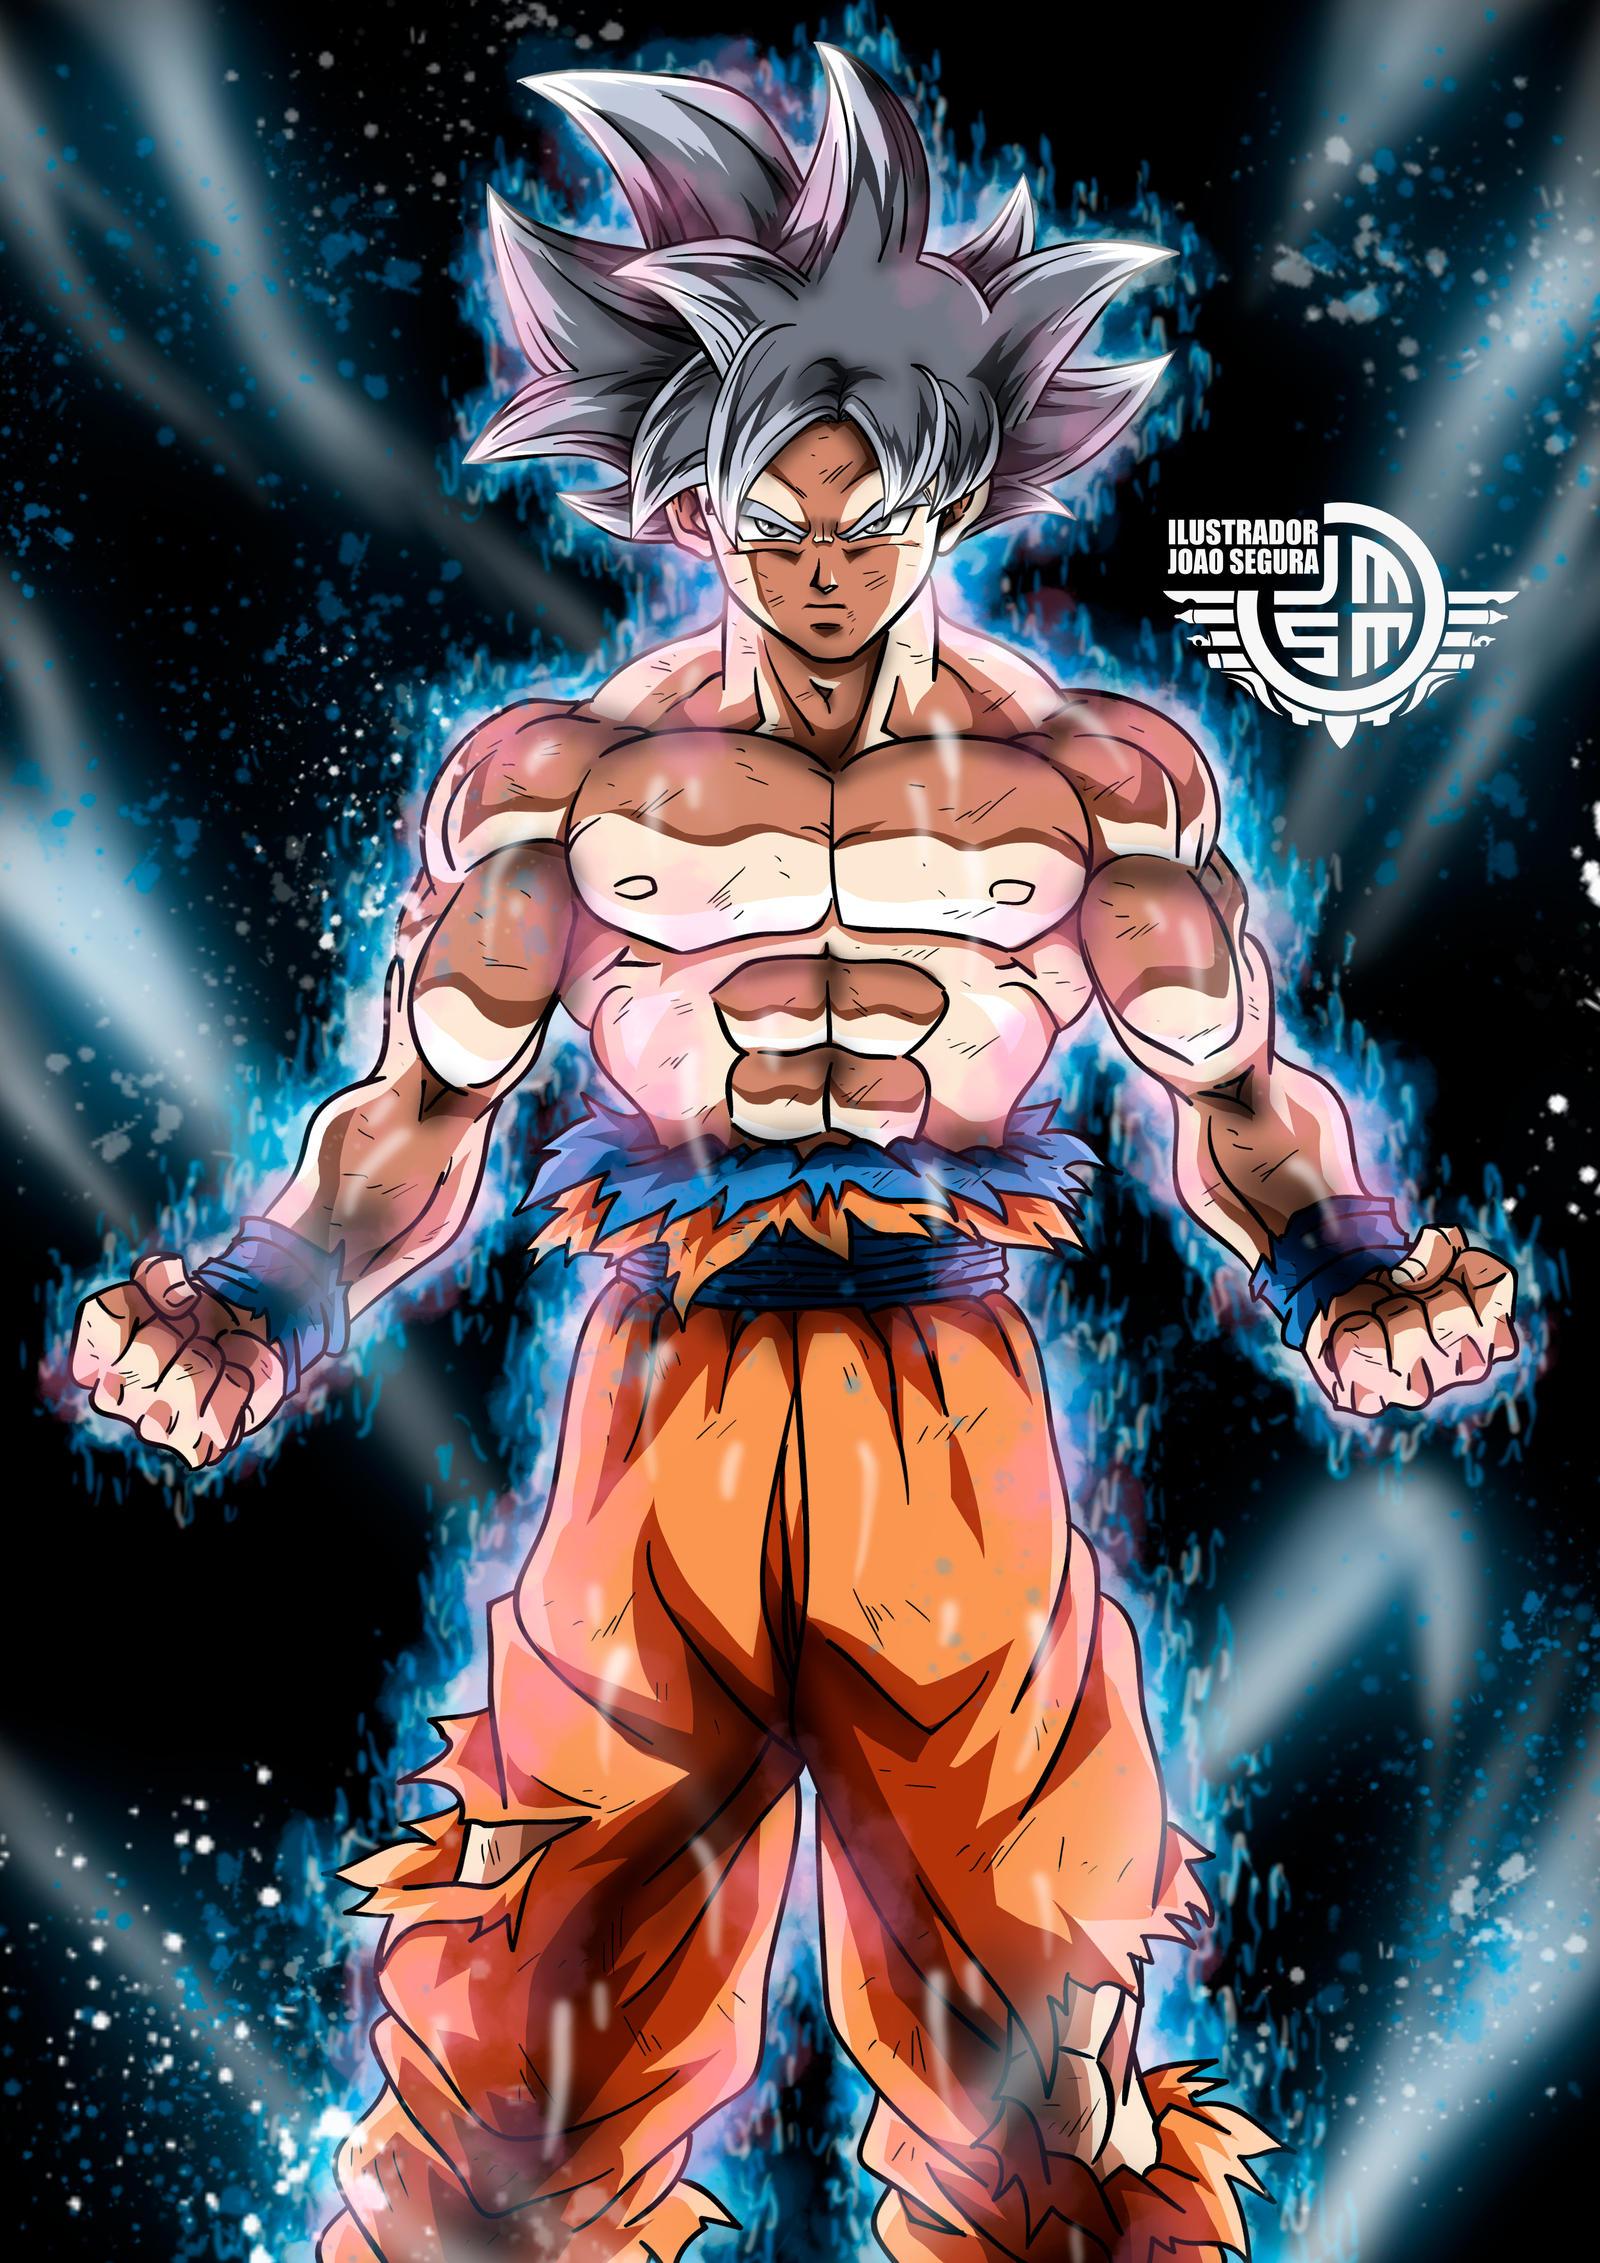 Goku Migatte No Gokui Dominado by ilustradorjoaosegura on DeviantArt